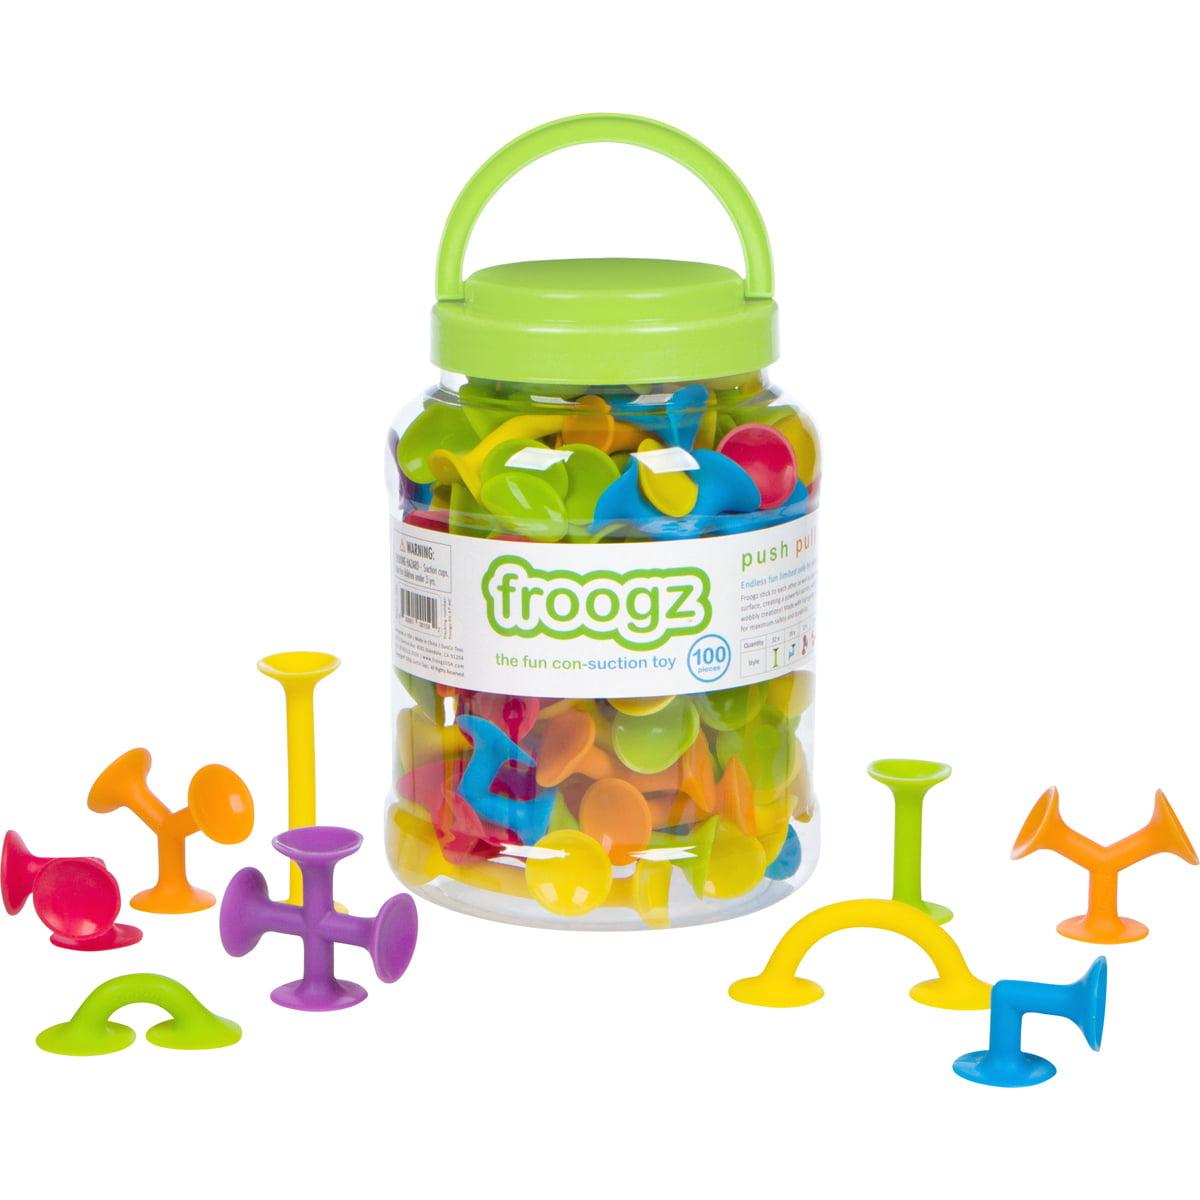 Froogz - 100 Piece Suction Toy Construction Set | Educational Building Kit